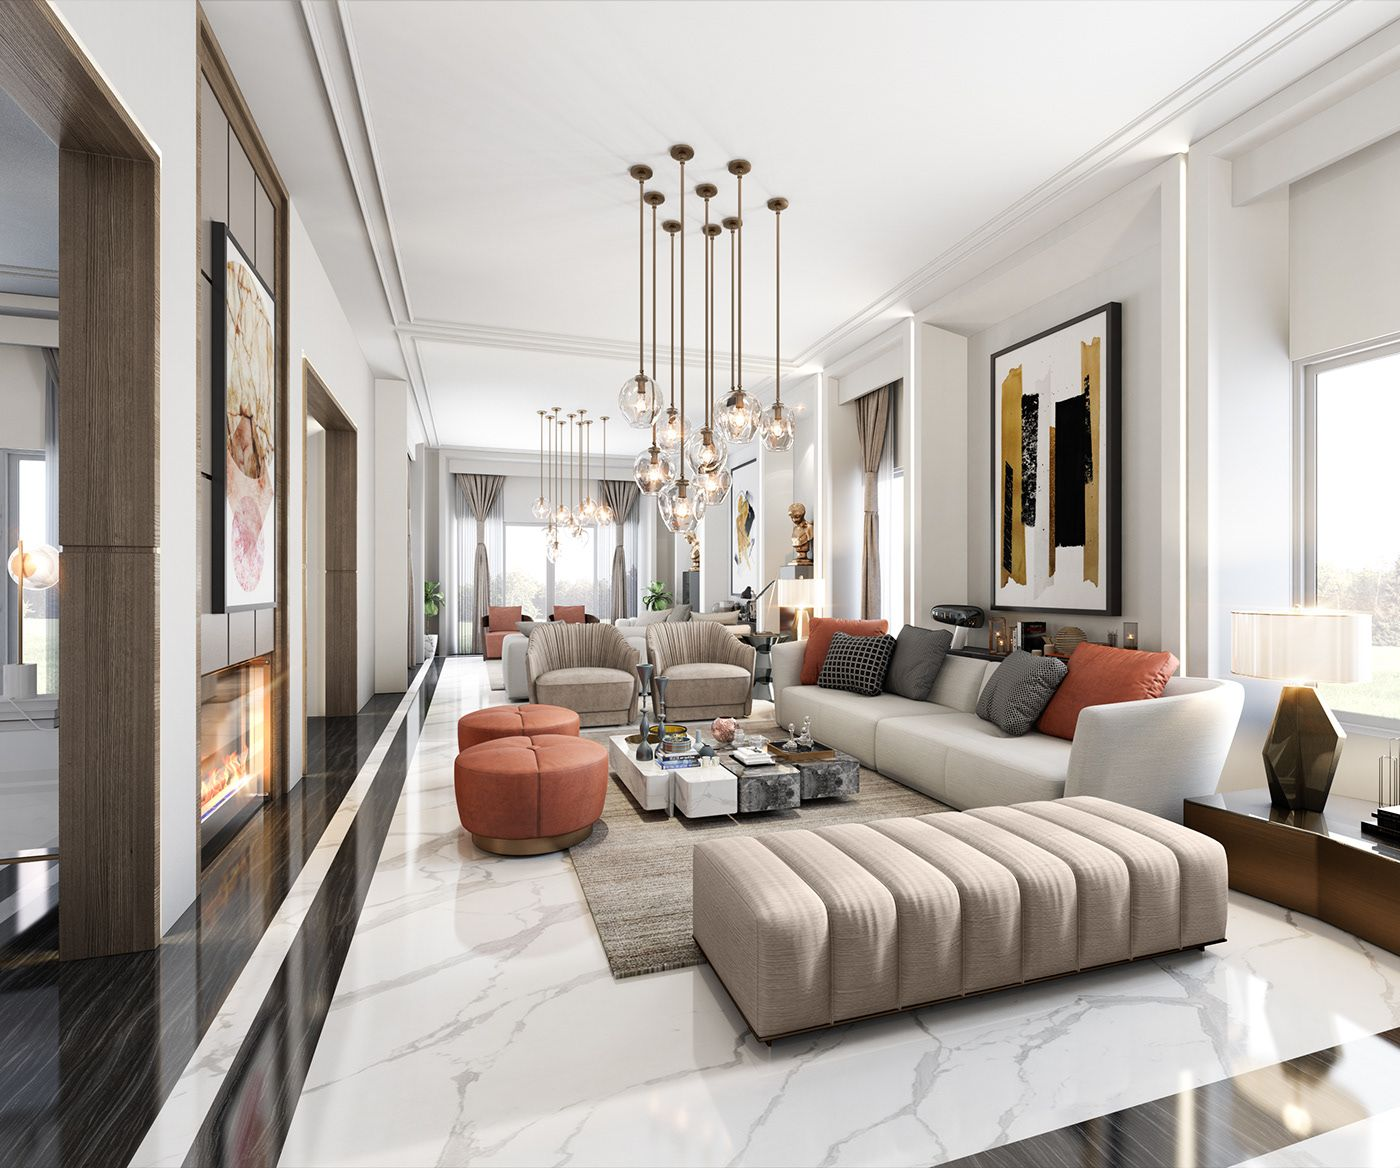 G F Palm Hills Reception On Behance Living Room Inspiration Interior Design Living Room Contemporary Living Room Design living room contemporary